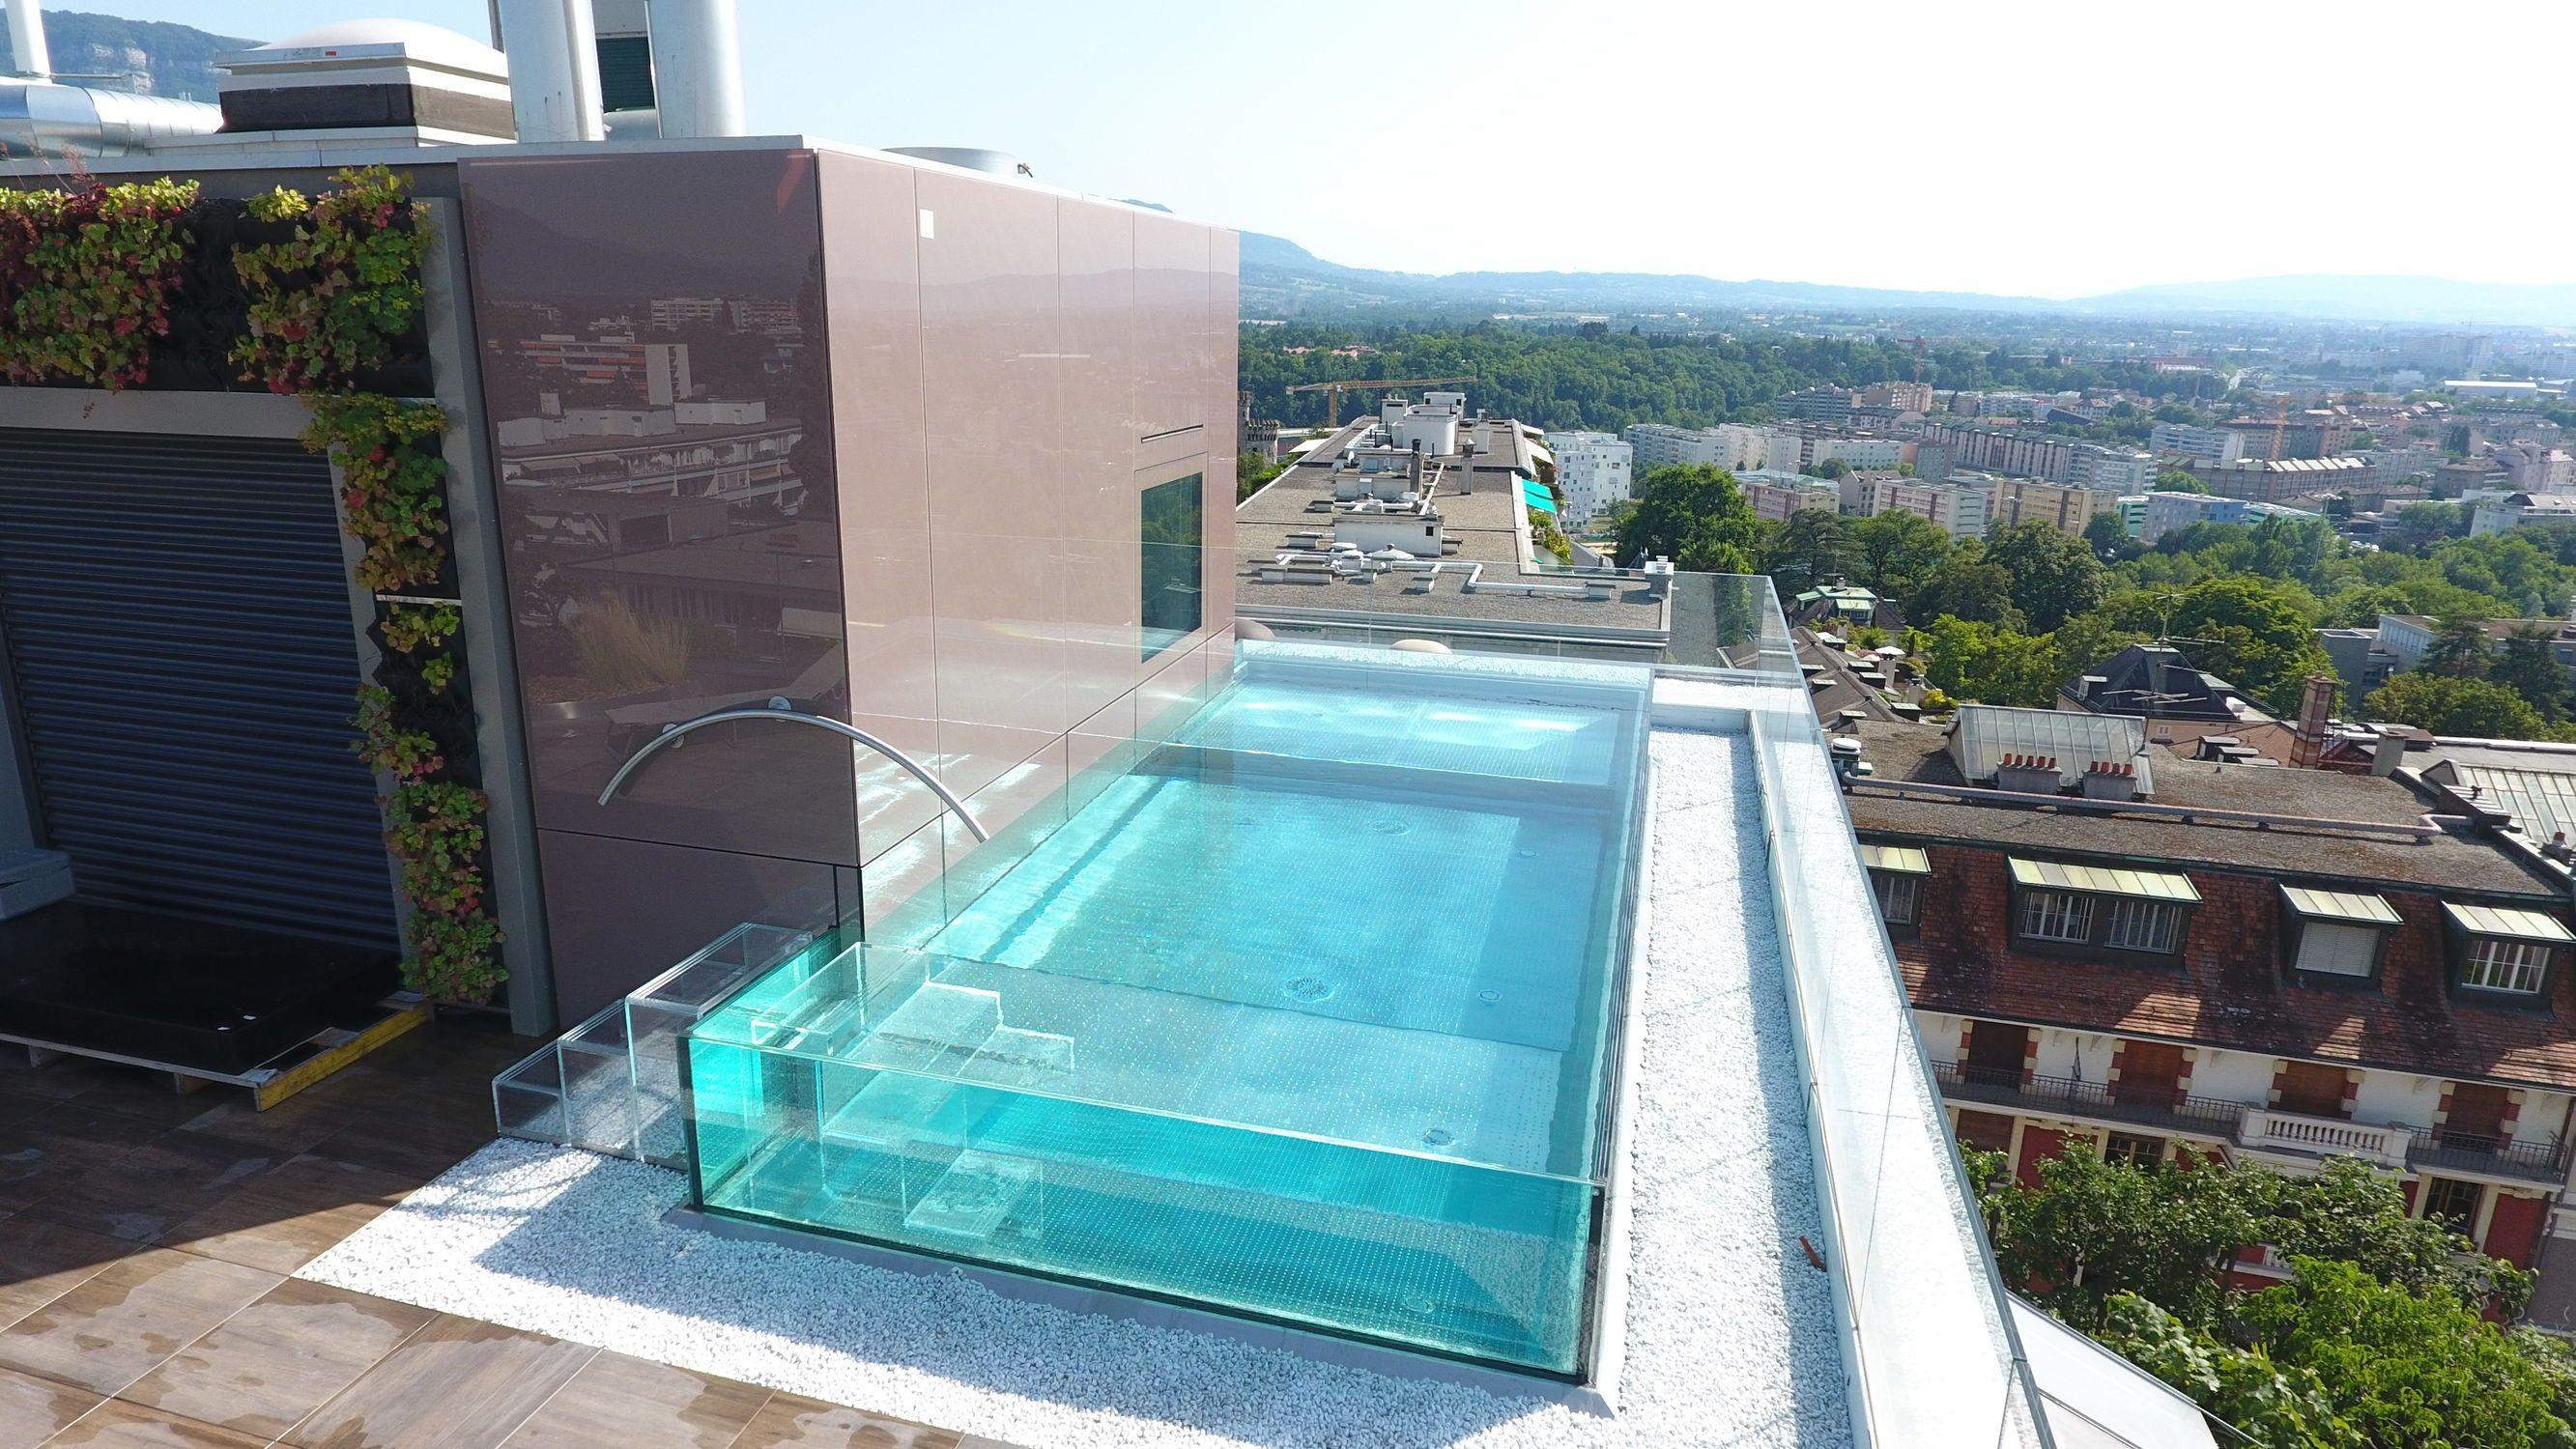 Piscina de acero inoxidable elegant cepillo recto piscina for Piscina acero inoxidable